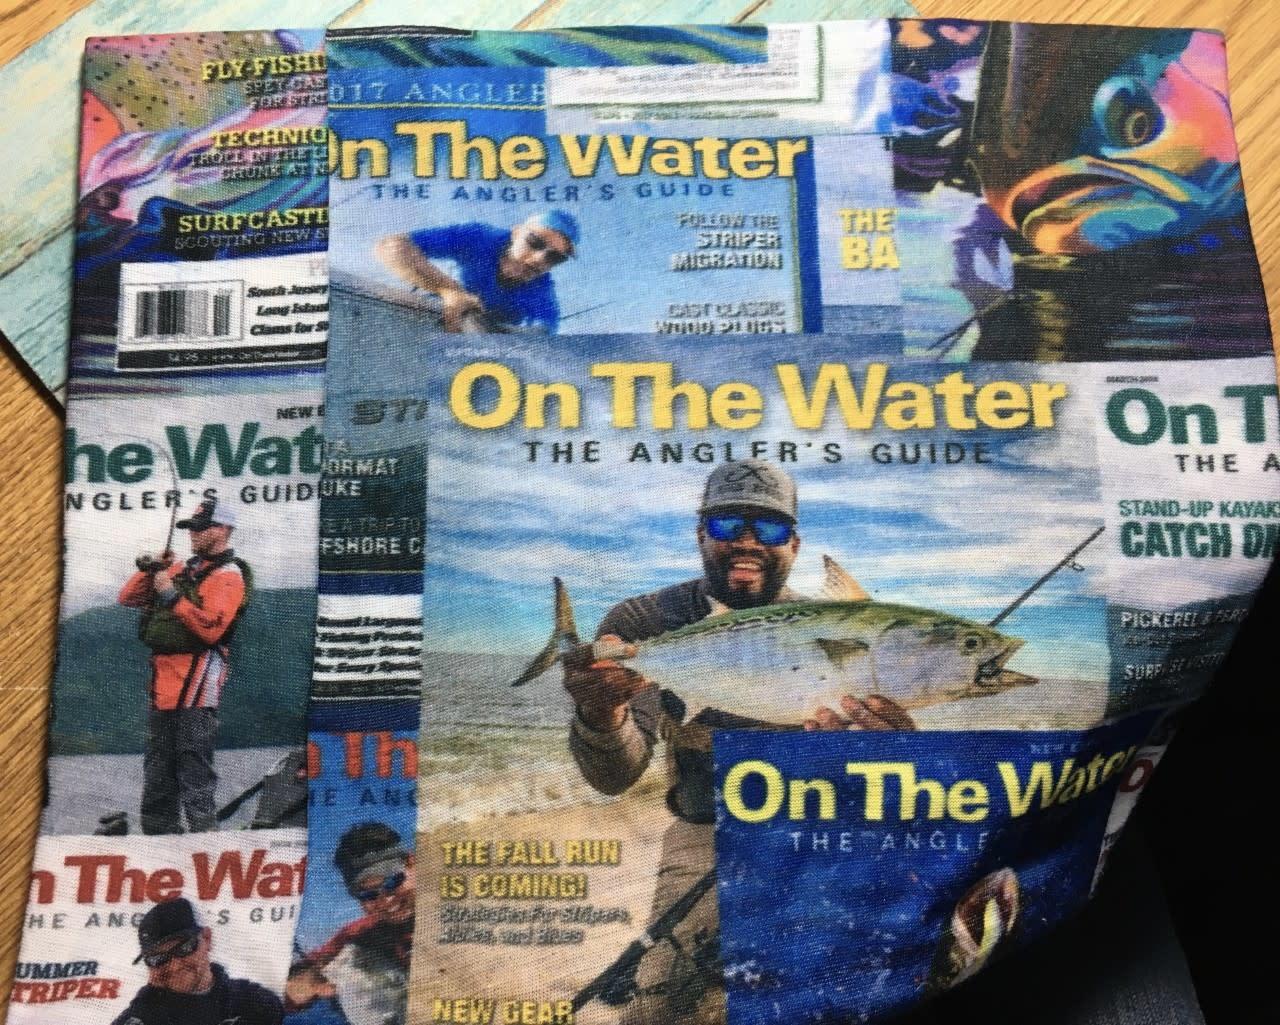 Neck Gaiter OTW Magazine Covers